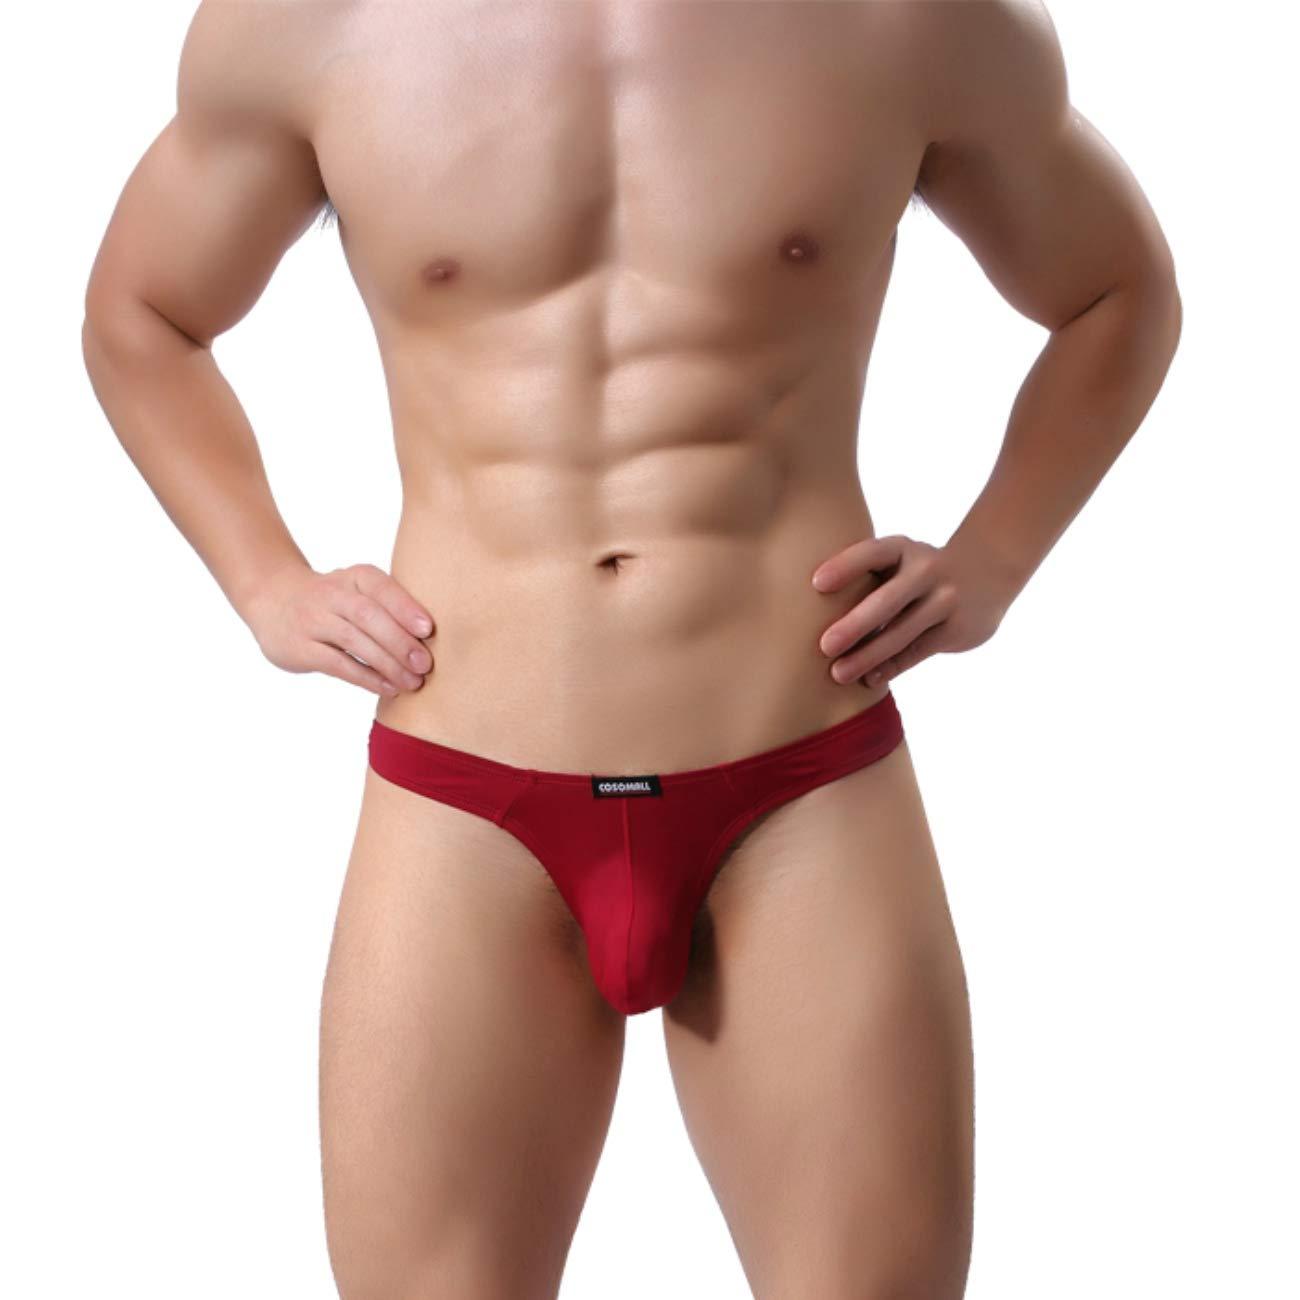 MuscleMate Premium Quality Men's Thong G-String, Men's Sport Underwear Comfort